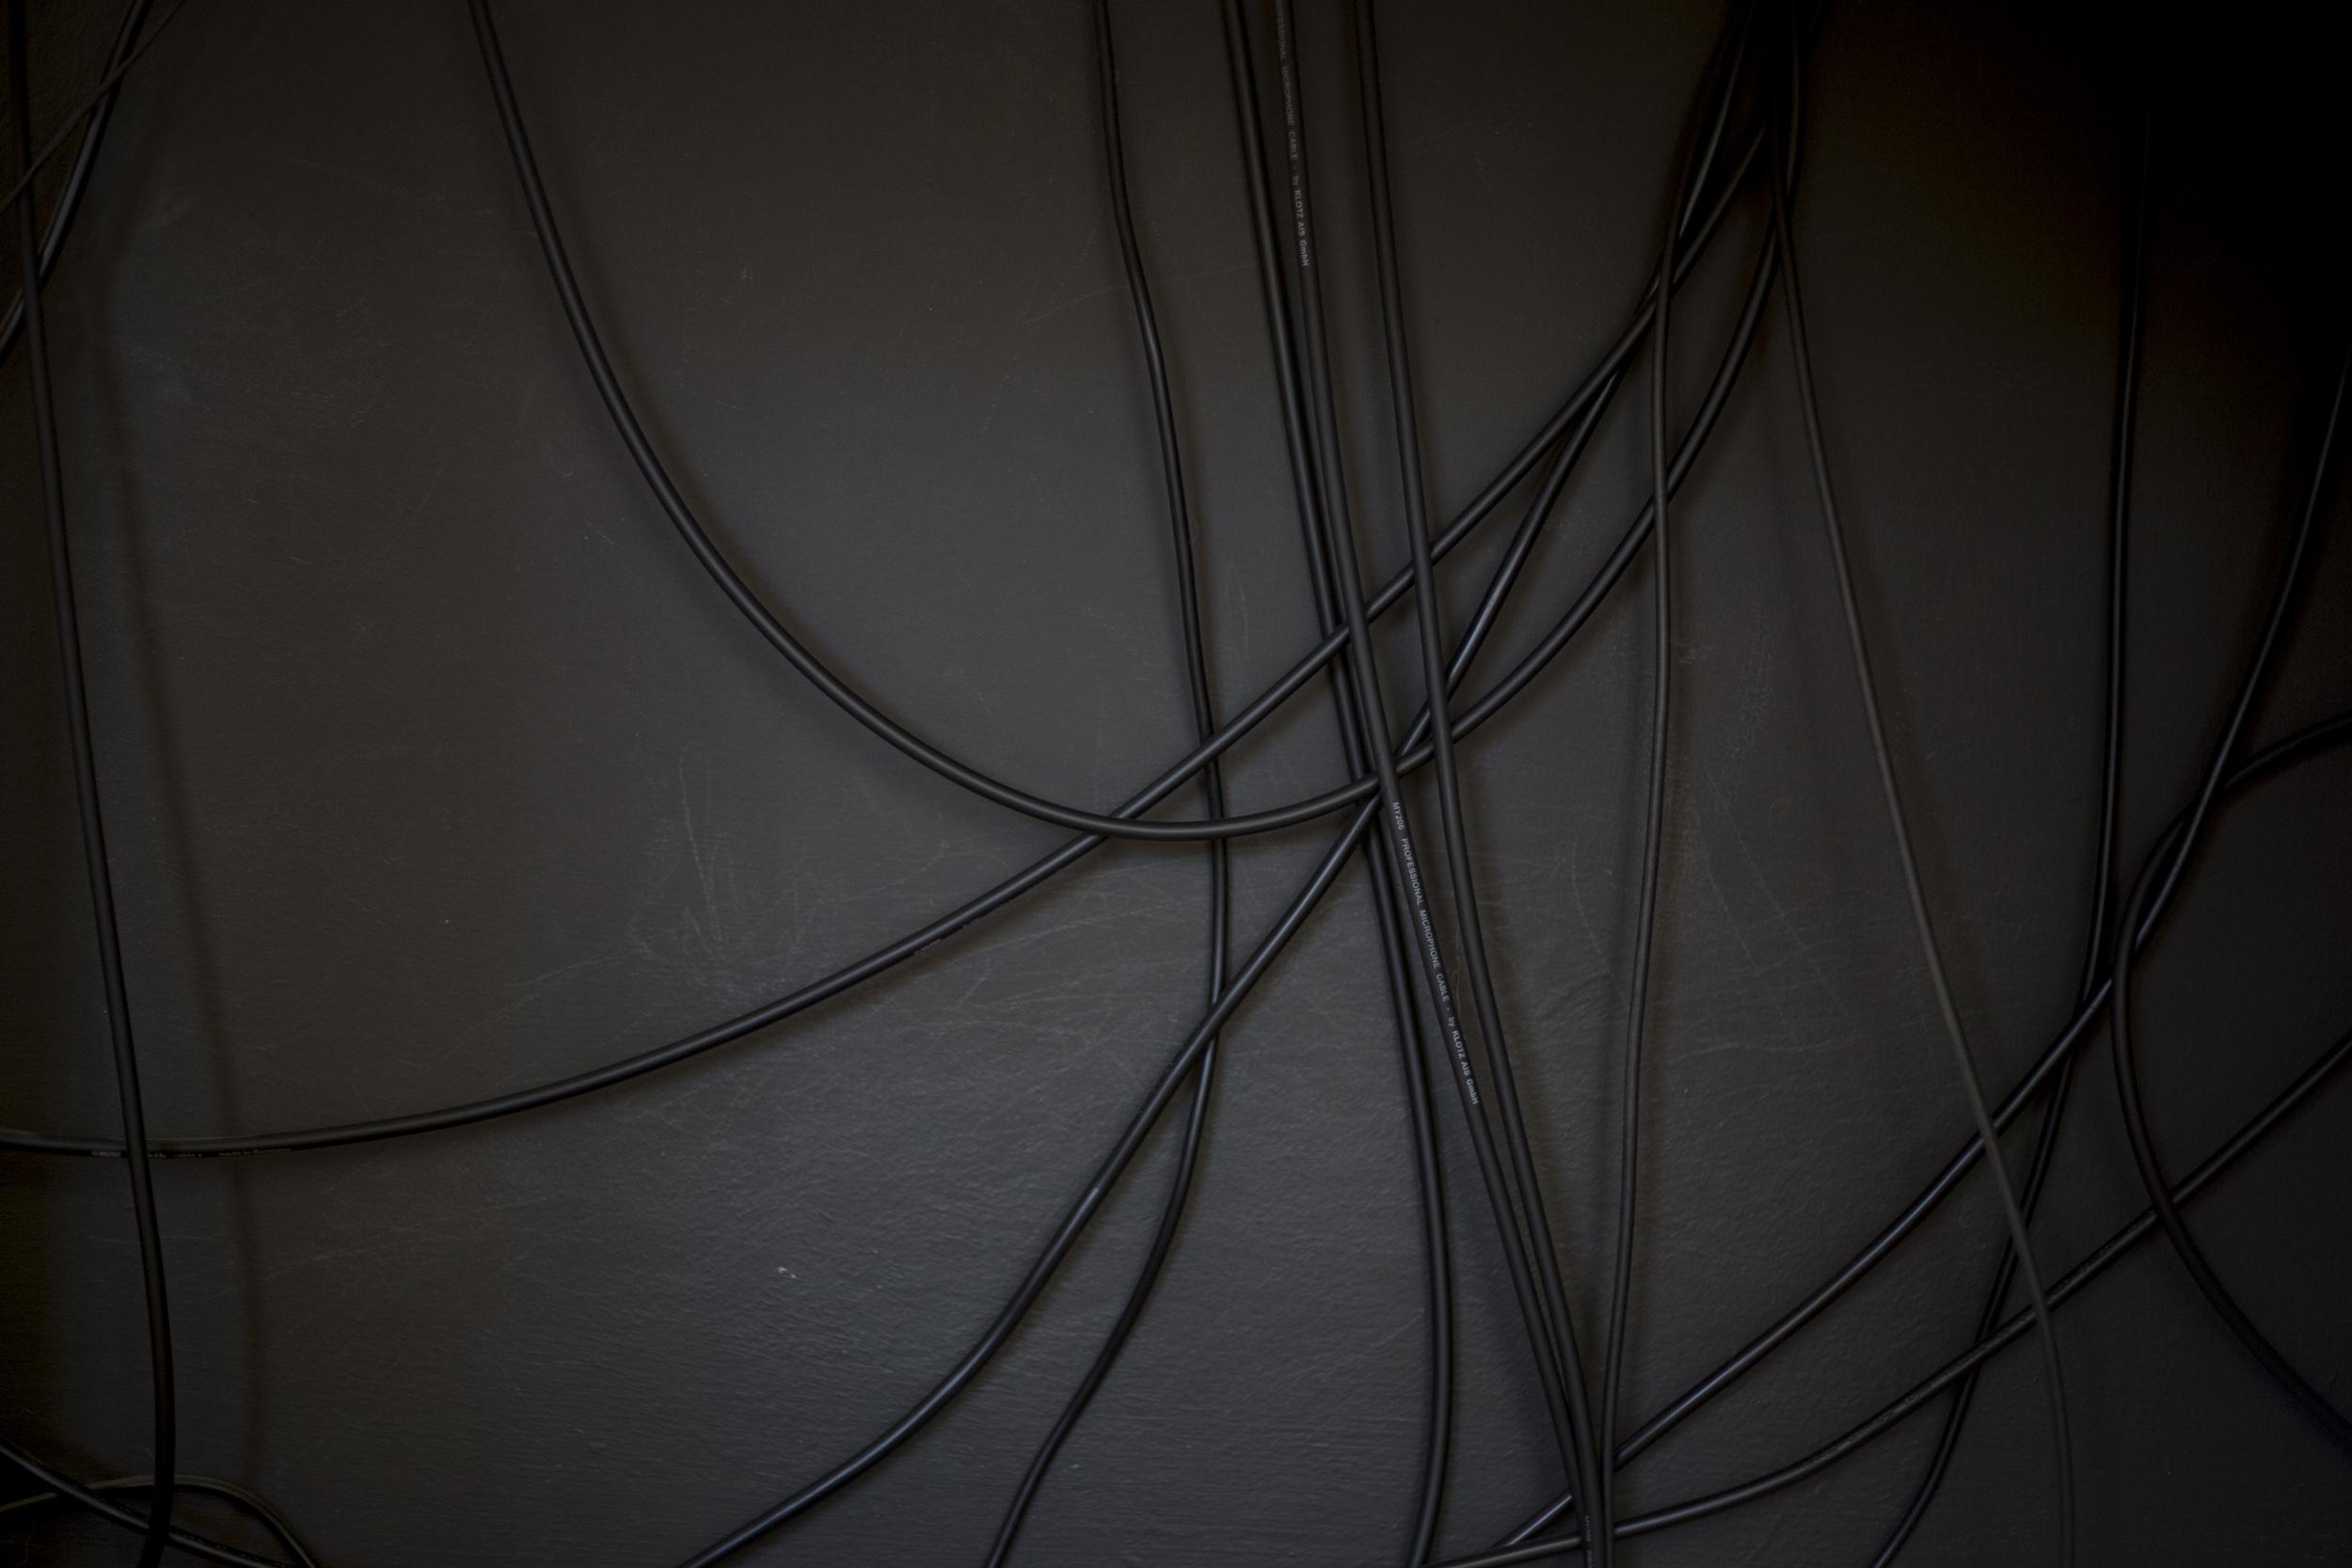 Abstract-50.jpg